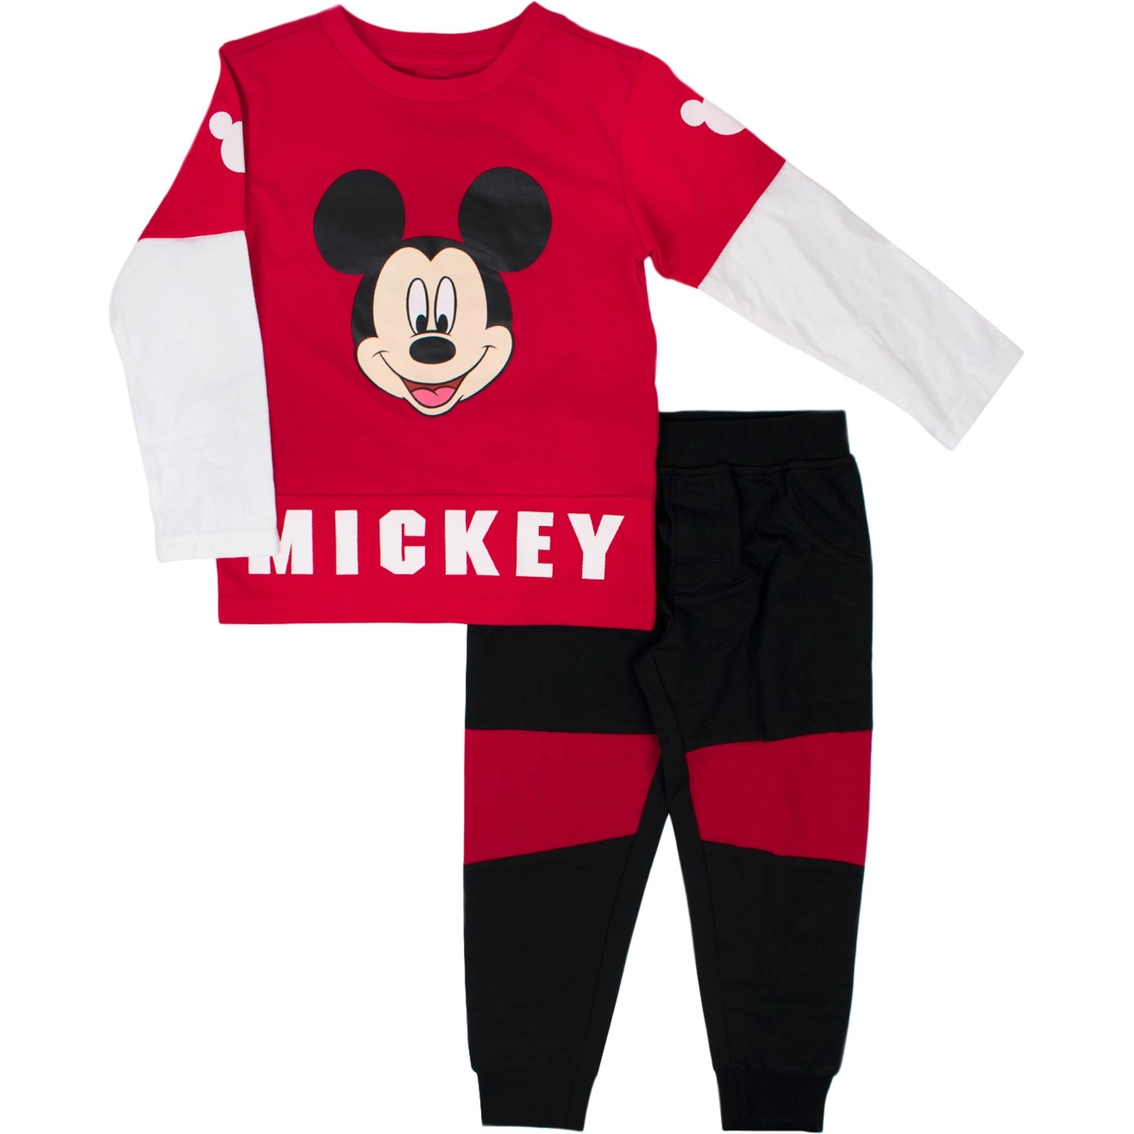 4dbd8a29e Disney Toddler Boys Mickey Mouse 2 Pc. Shirt And Pants Set | Toddler ...